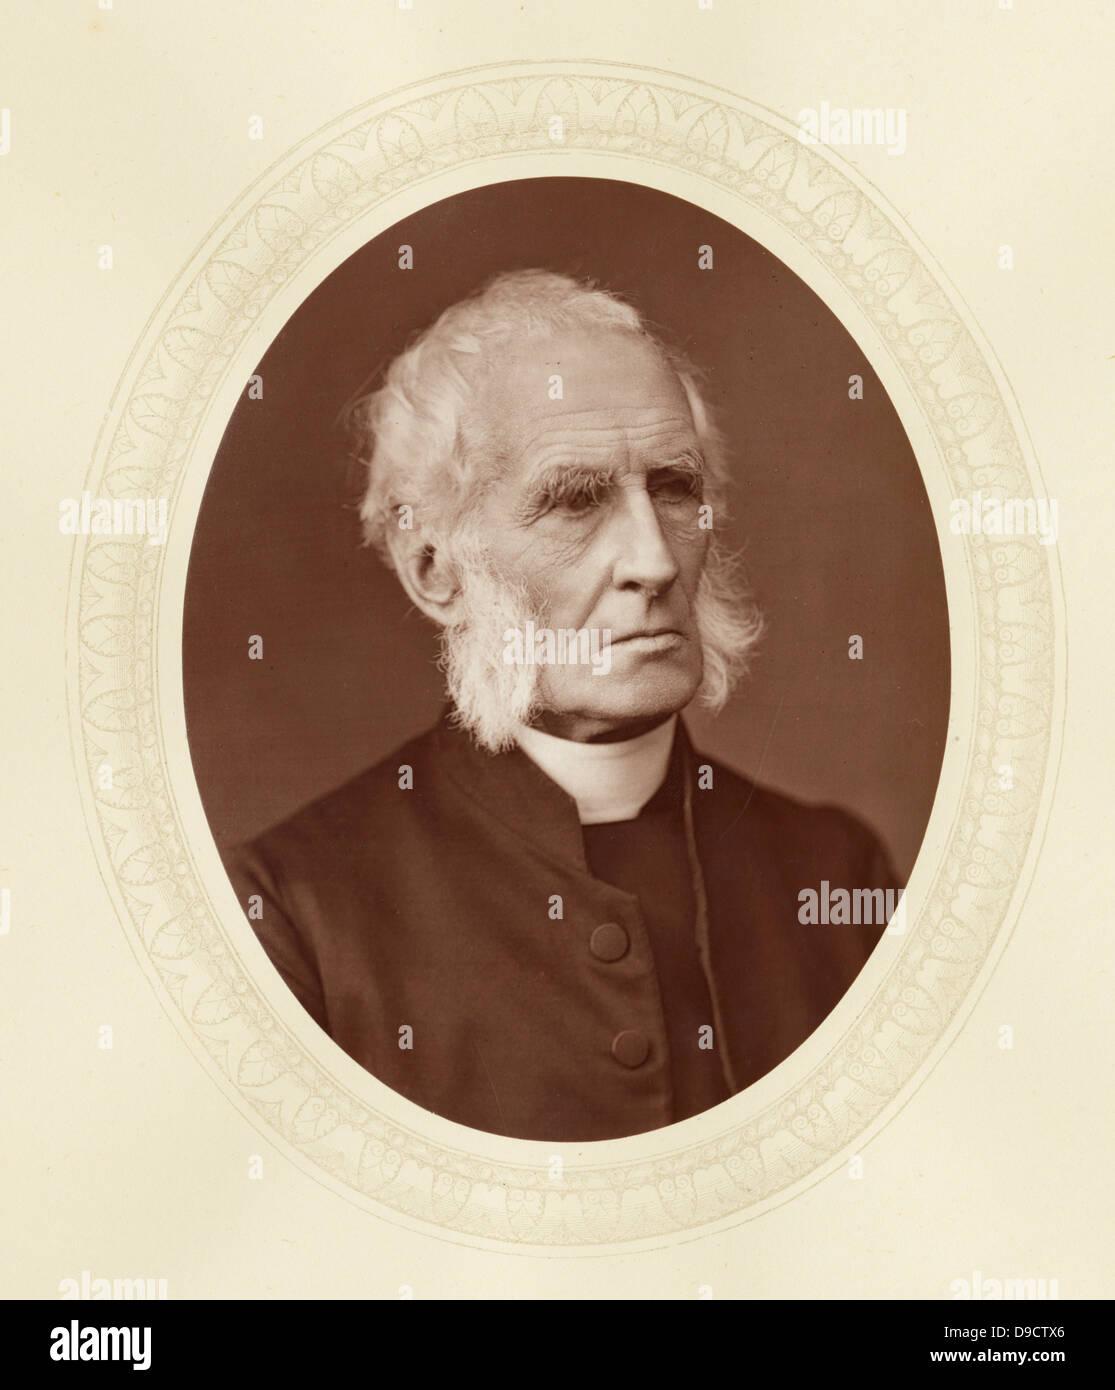 Alfred Ollivant (1798-1882) c1878, English churchman who was Bishop of Llandaff 1842-188. - Stock Image